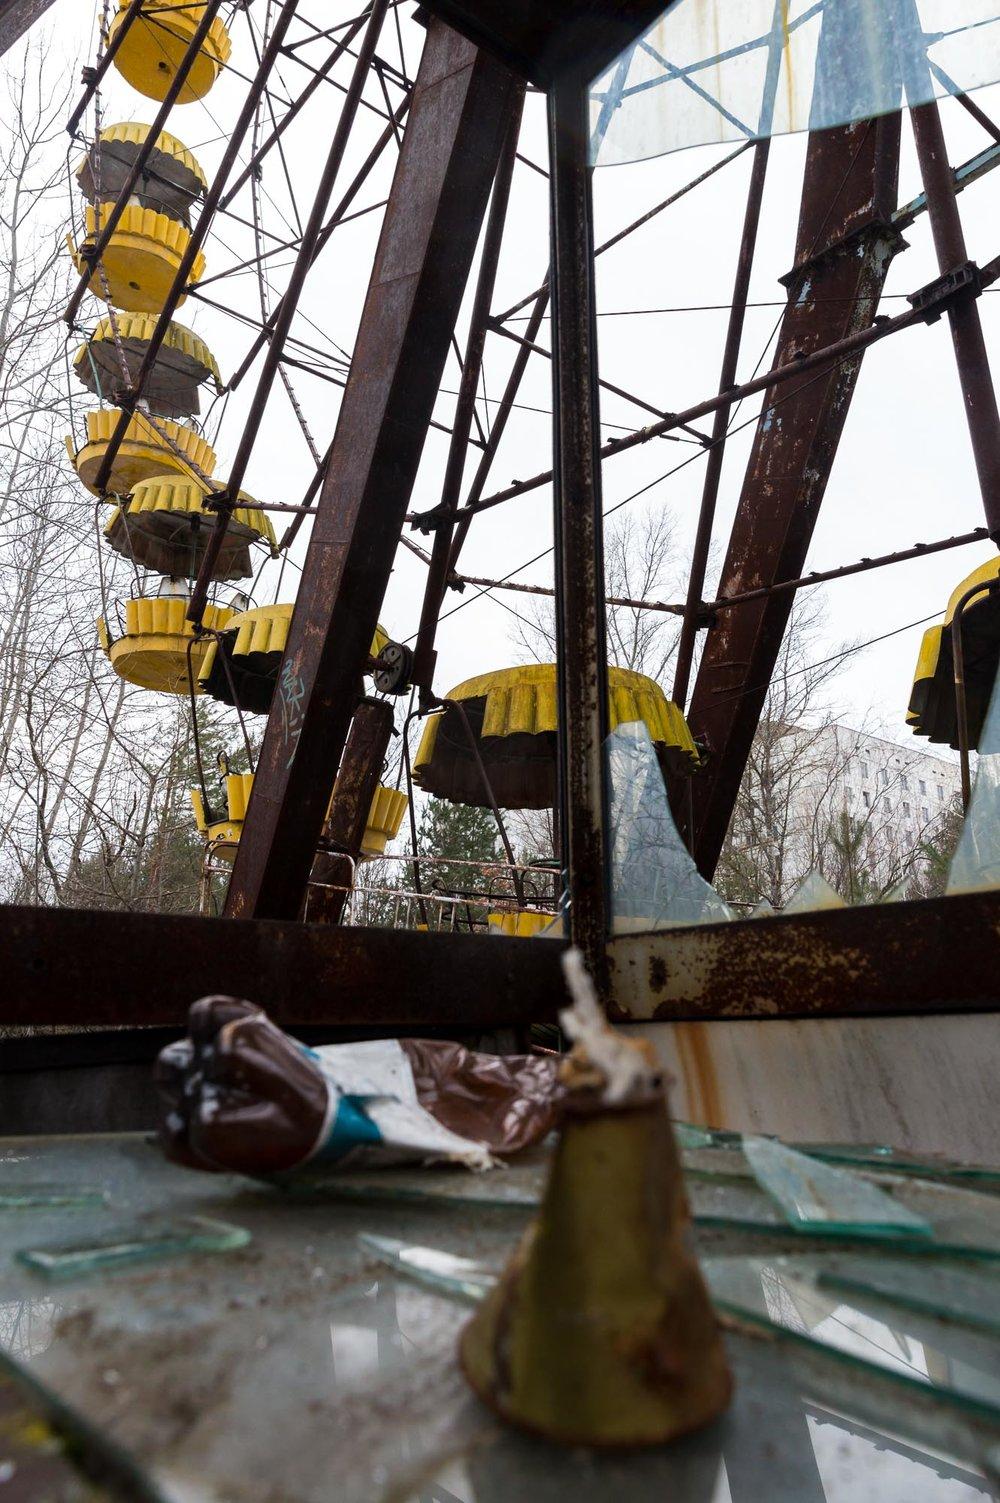 2017_01_02_ben_kepka_cultured_kiwi_Ukraine_Chernobyl-15.jpg